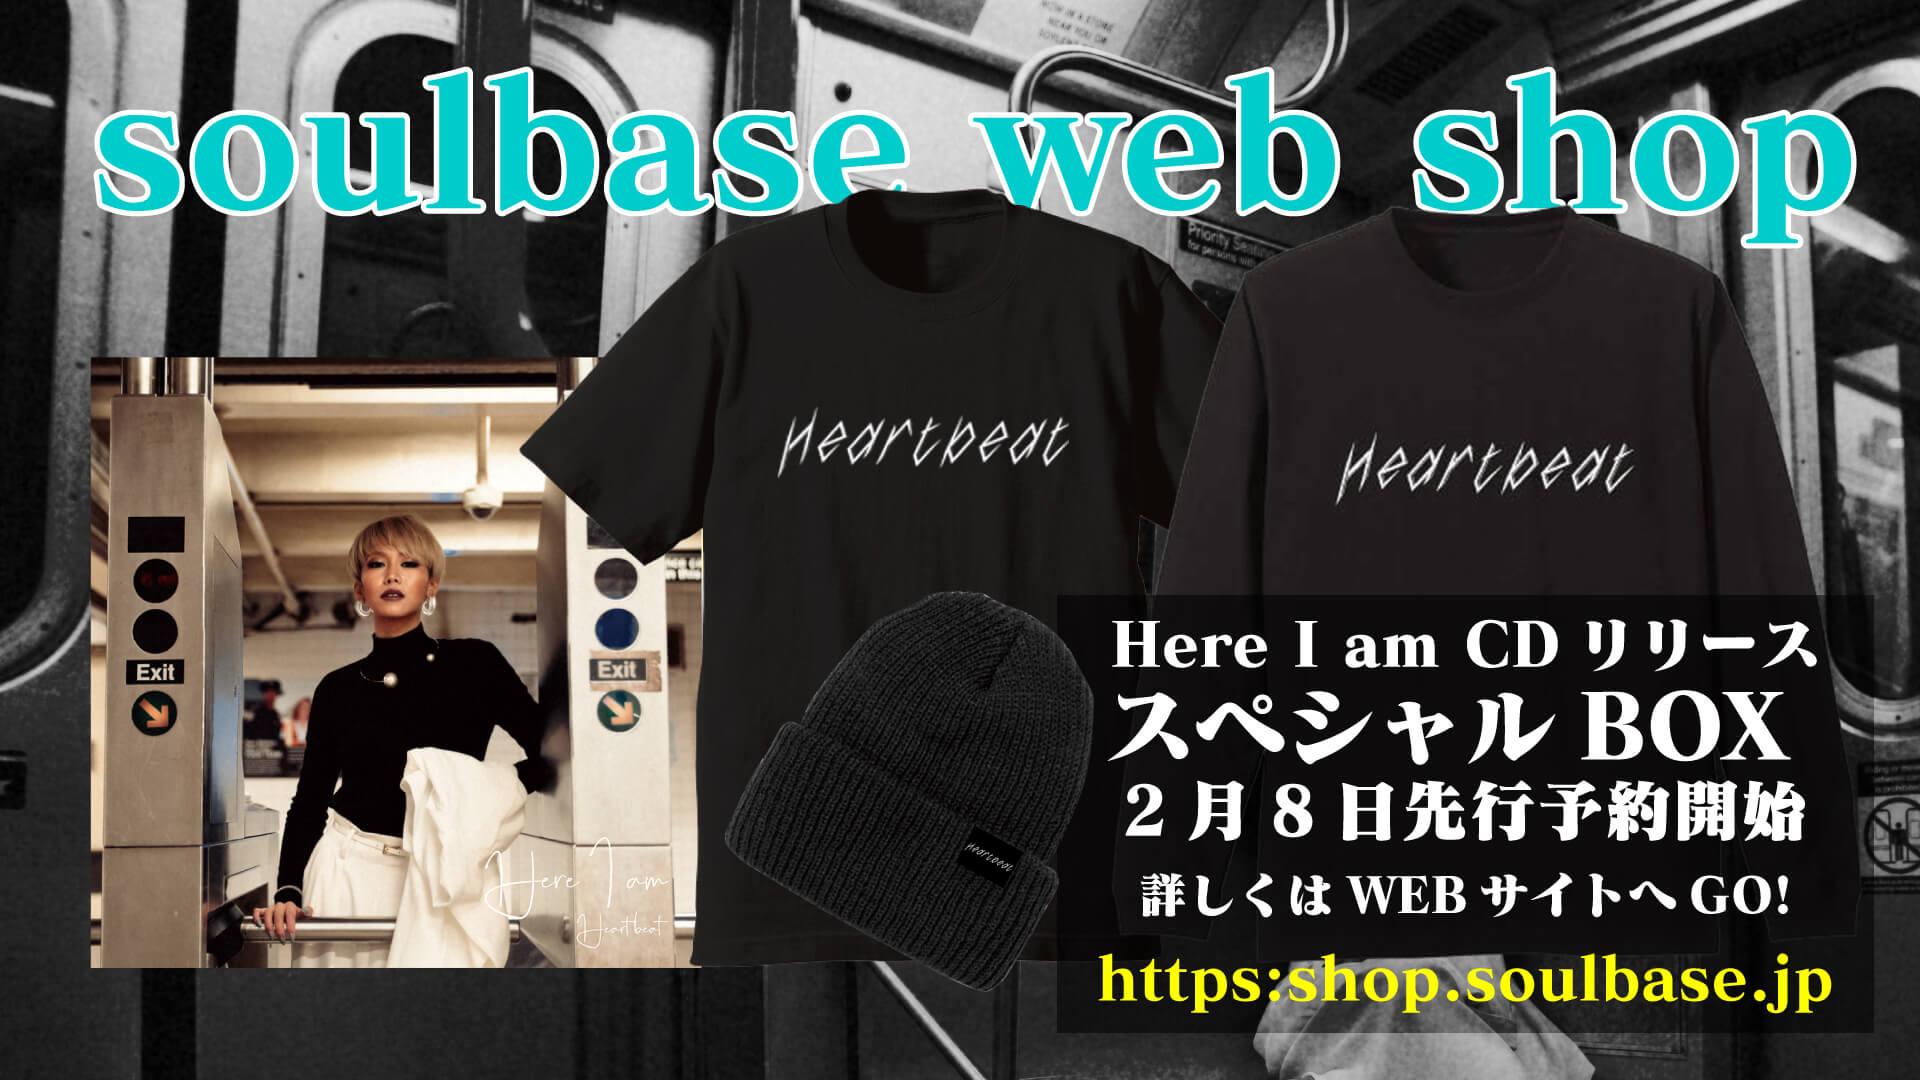 「Here I am」CDリリース Official Web Shopにて先行予約開始